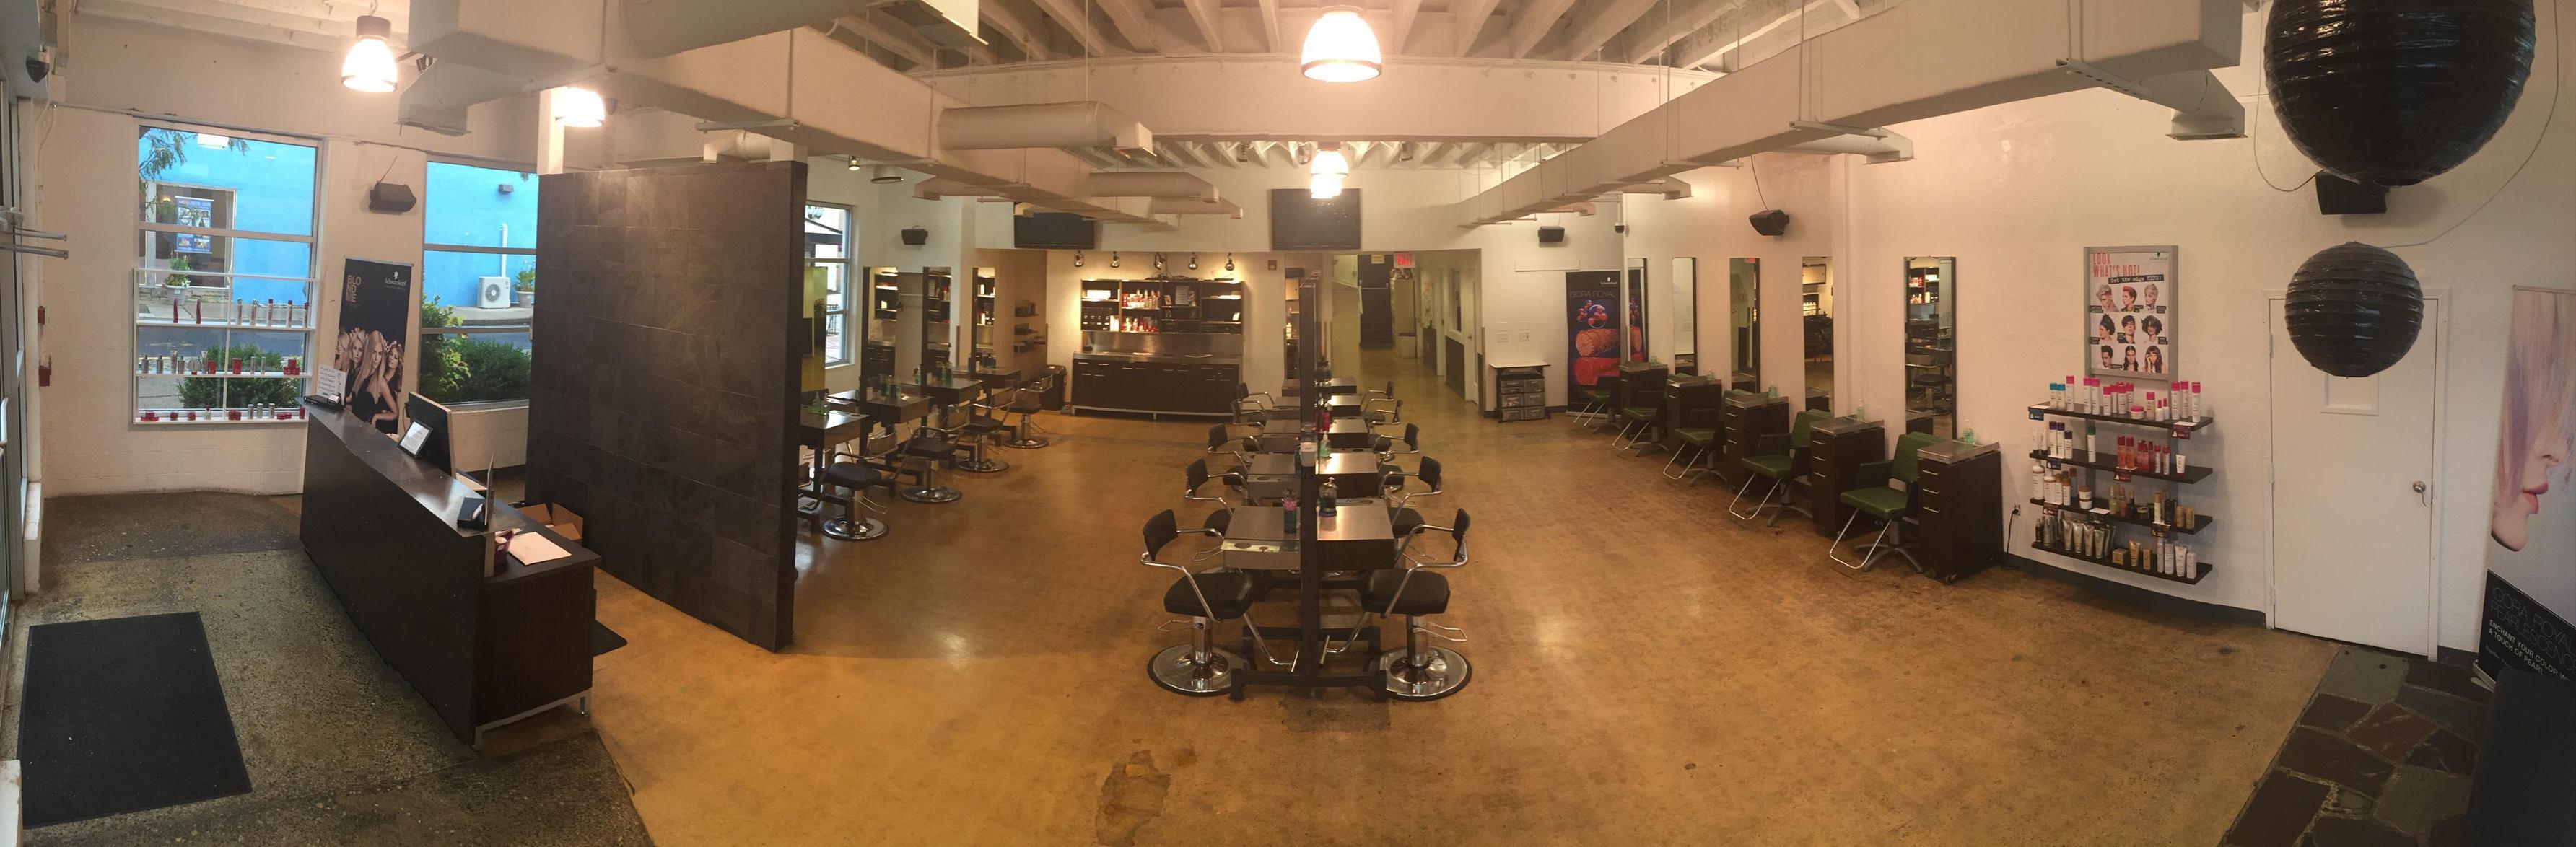 The Beauty Institute - Schwarzkopf Professional image 2